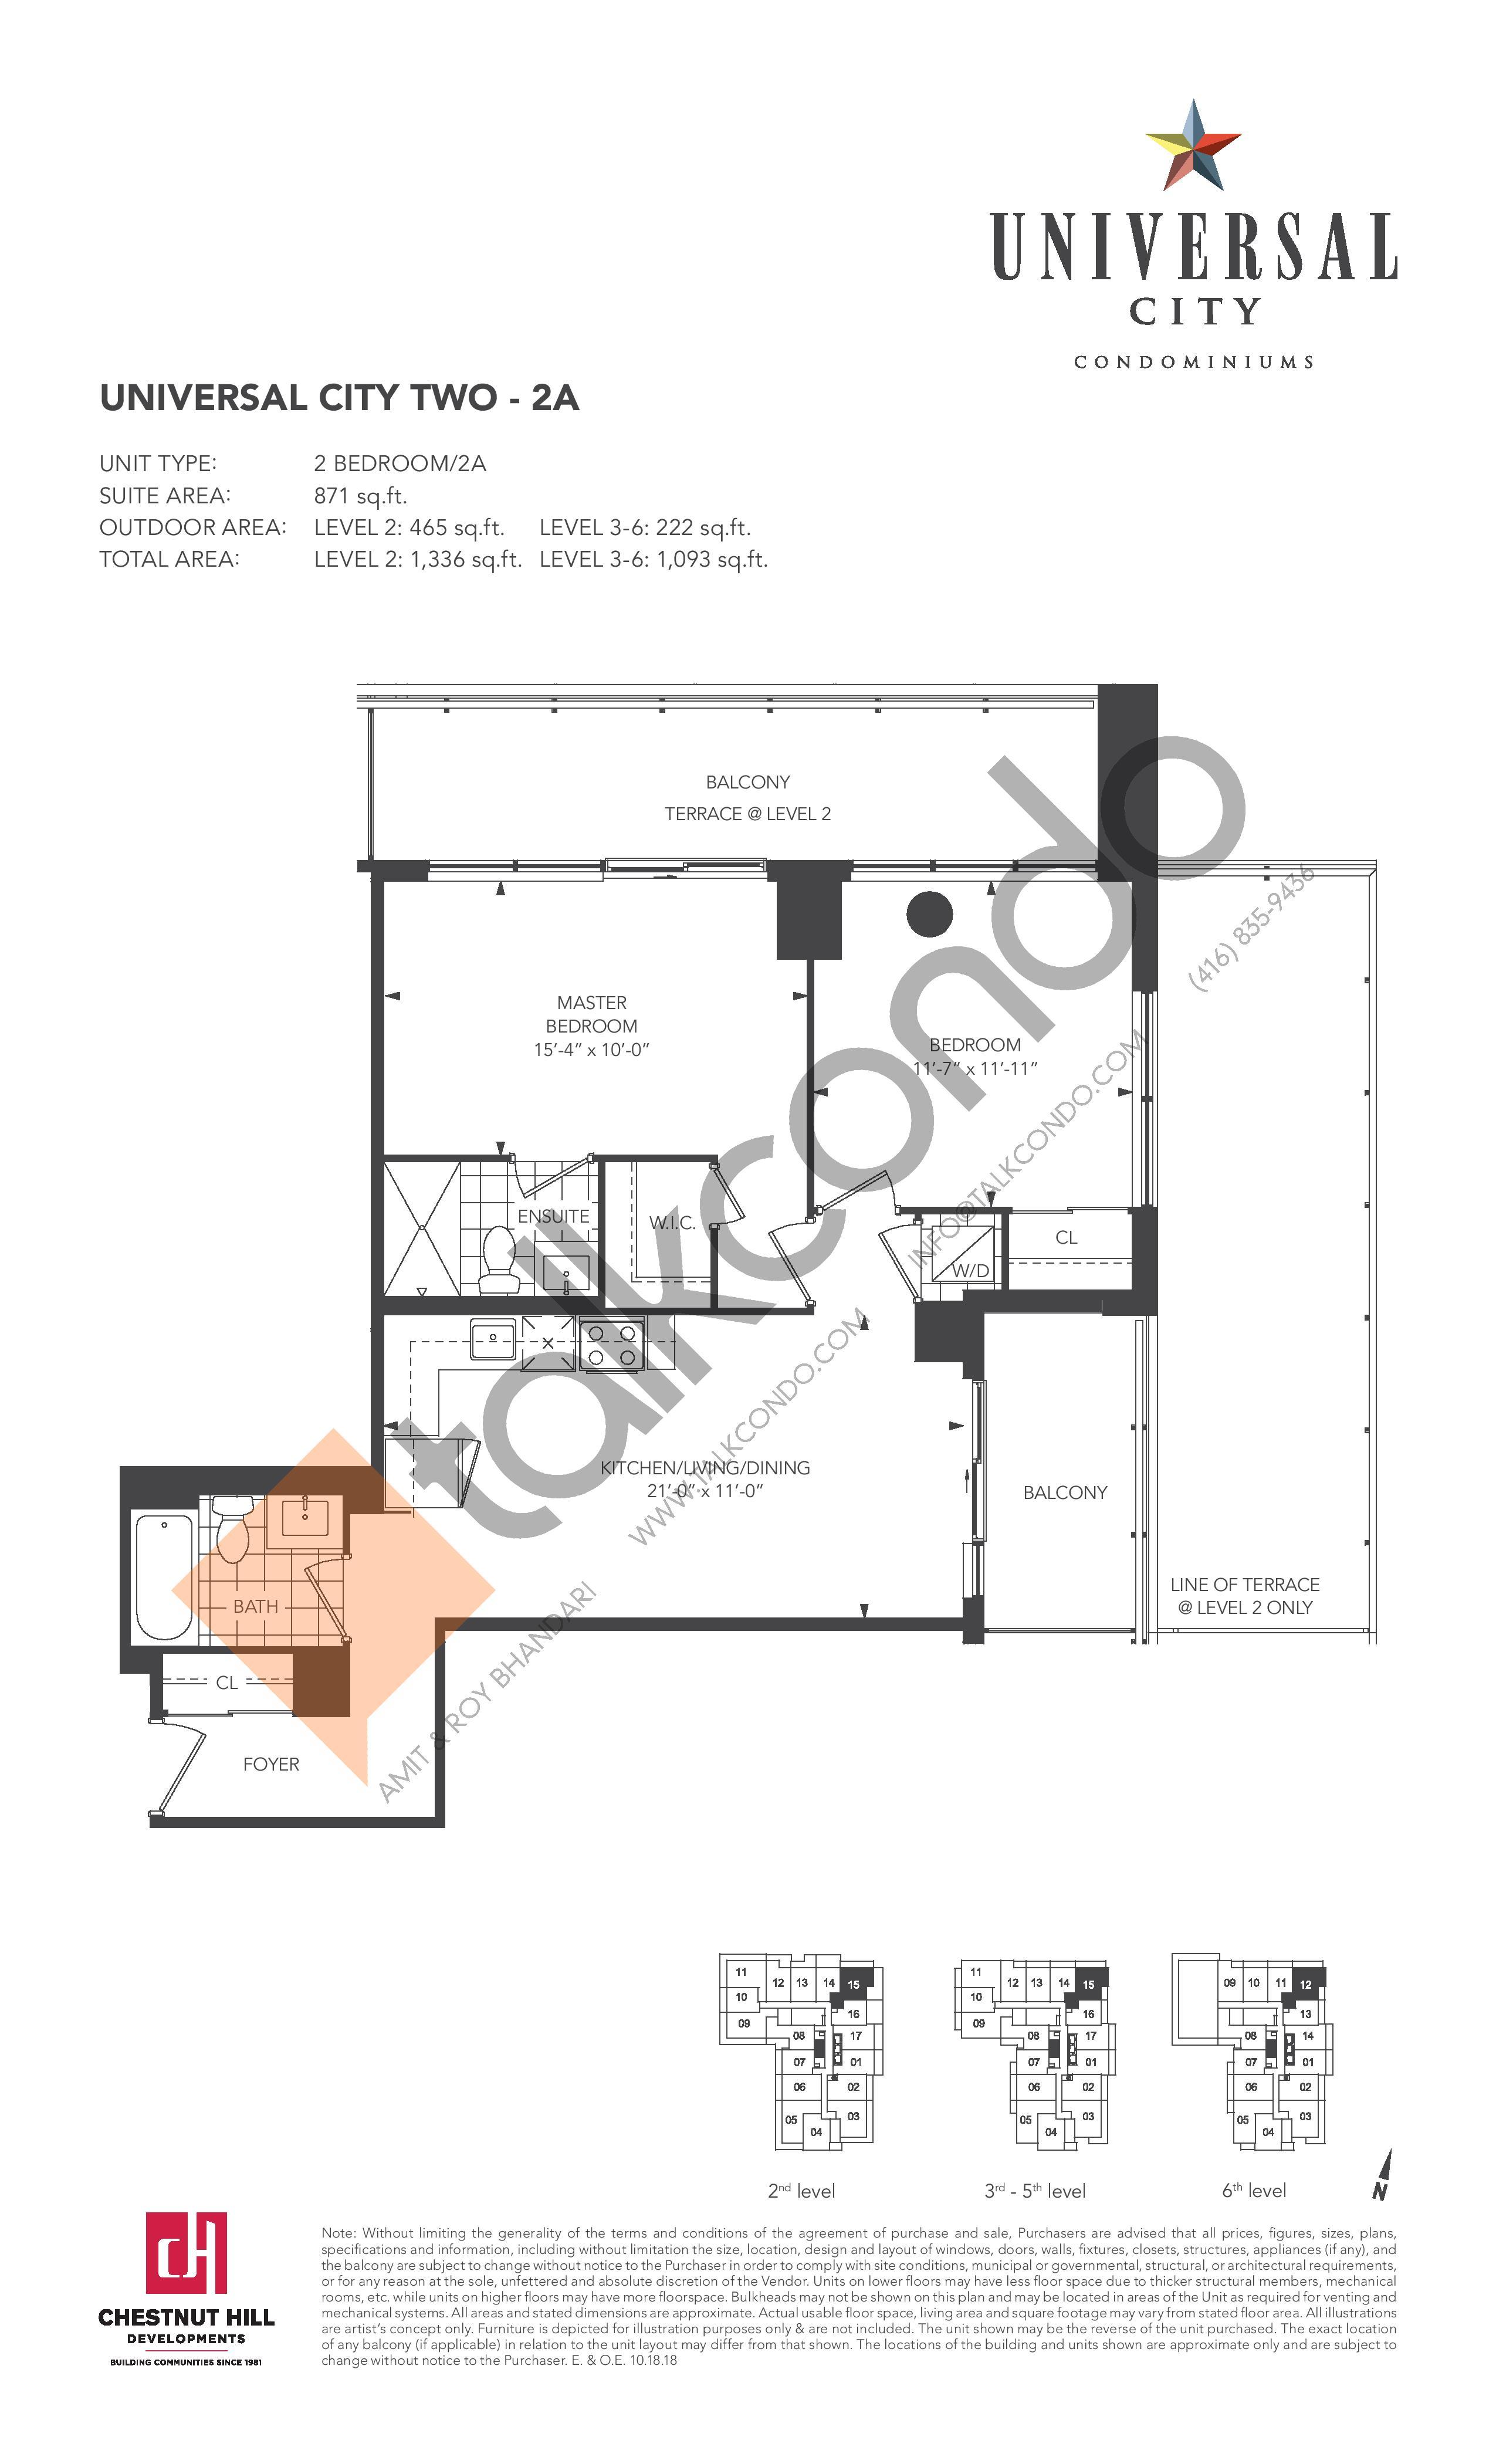 2A Floor Plan at Universal City 2 Condos - 871 sq.ft